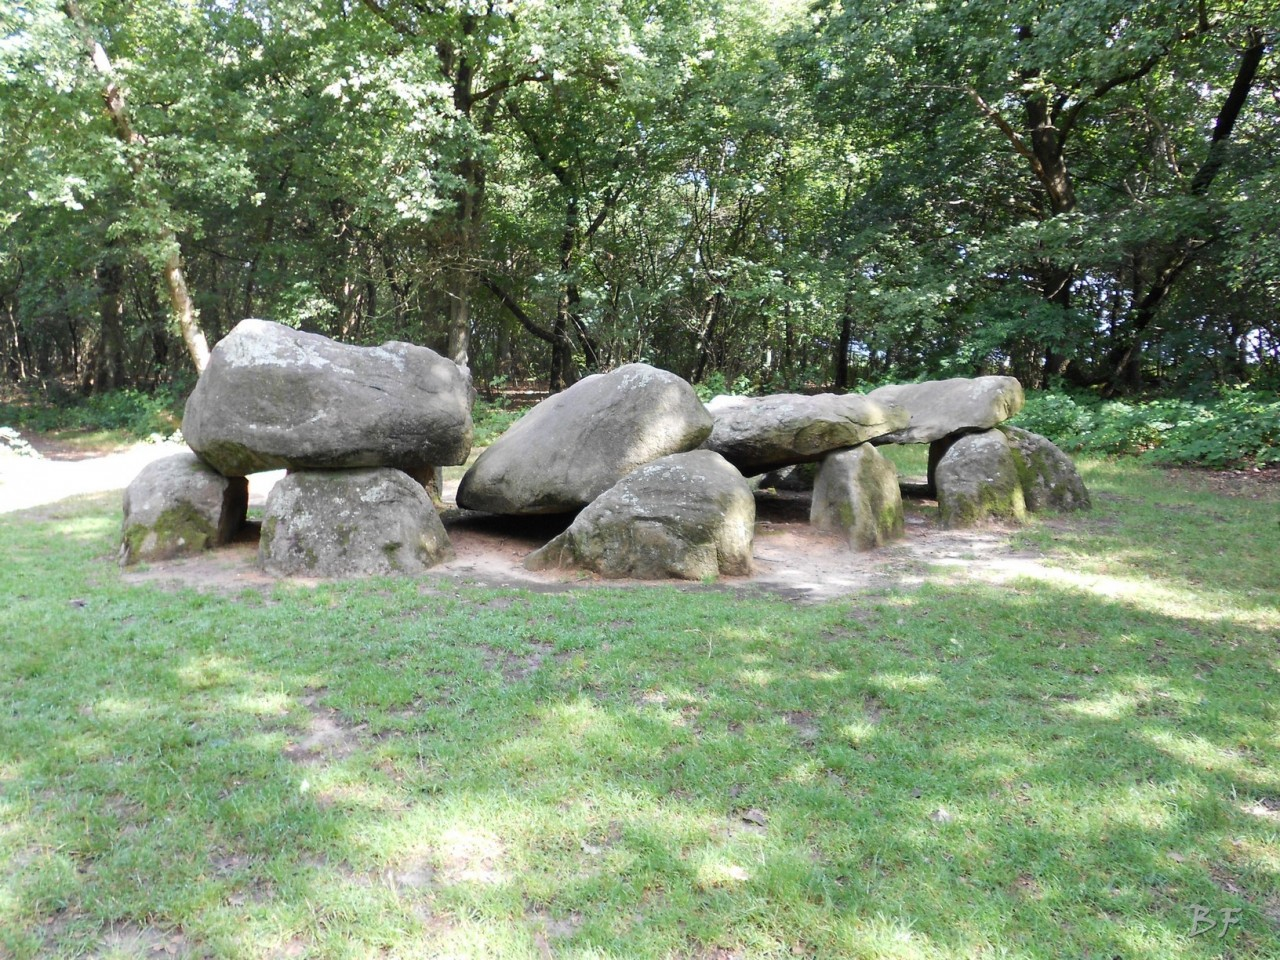 Hunebedden-Dolmen-Megaliti-Groeningen-Drenthe-Paesi-Bassi-62